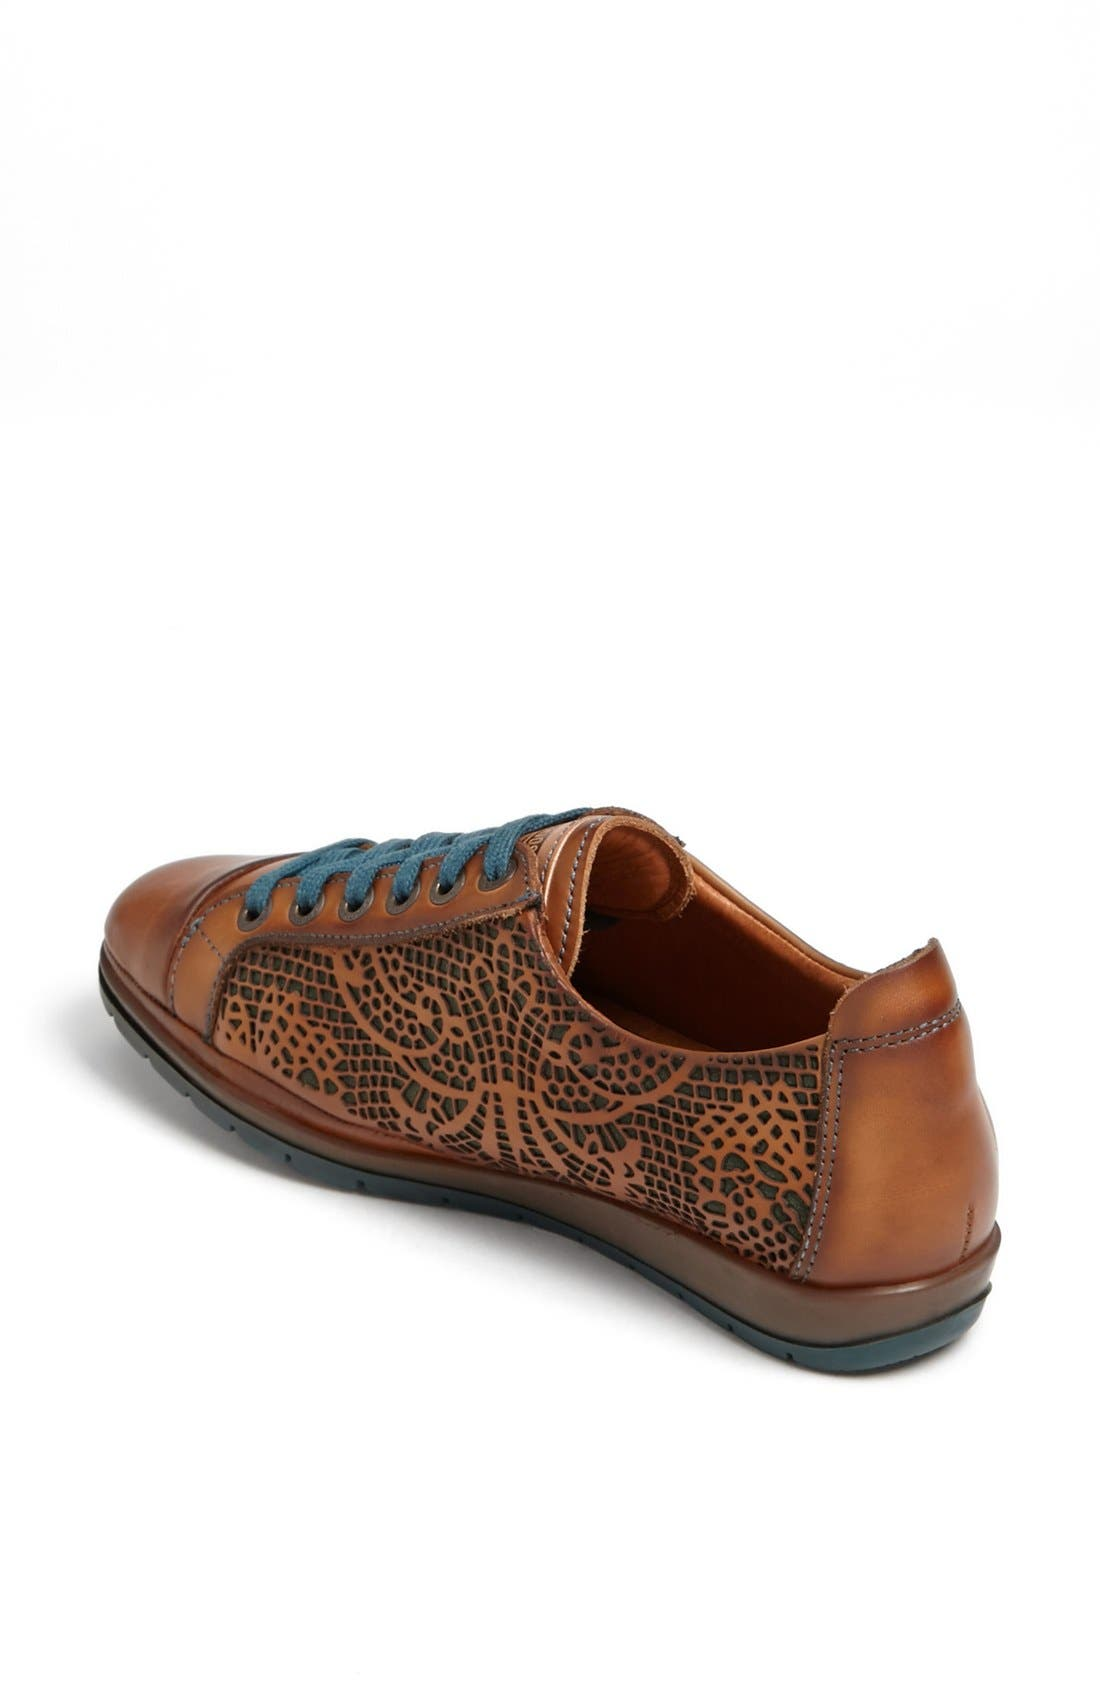 'Granada' Sneaker,                             Alternate thumbnail 2, color,                             200